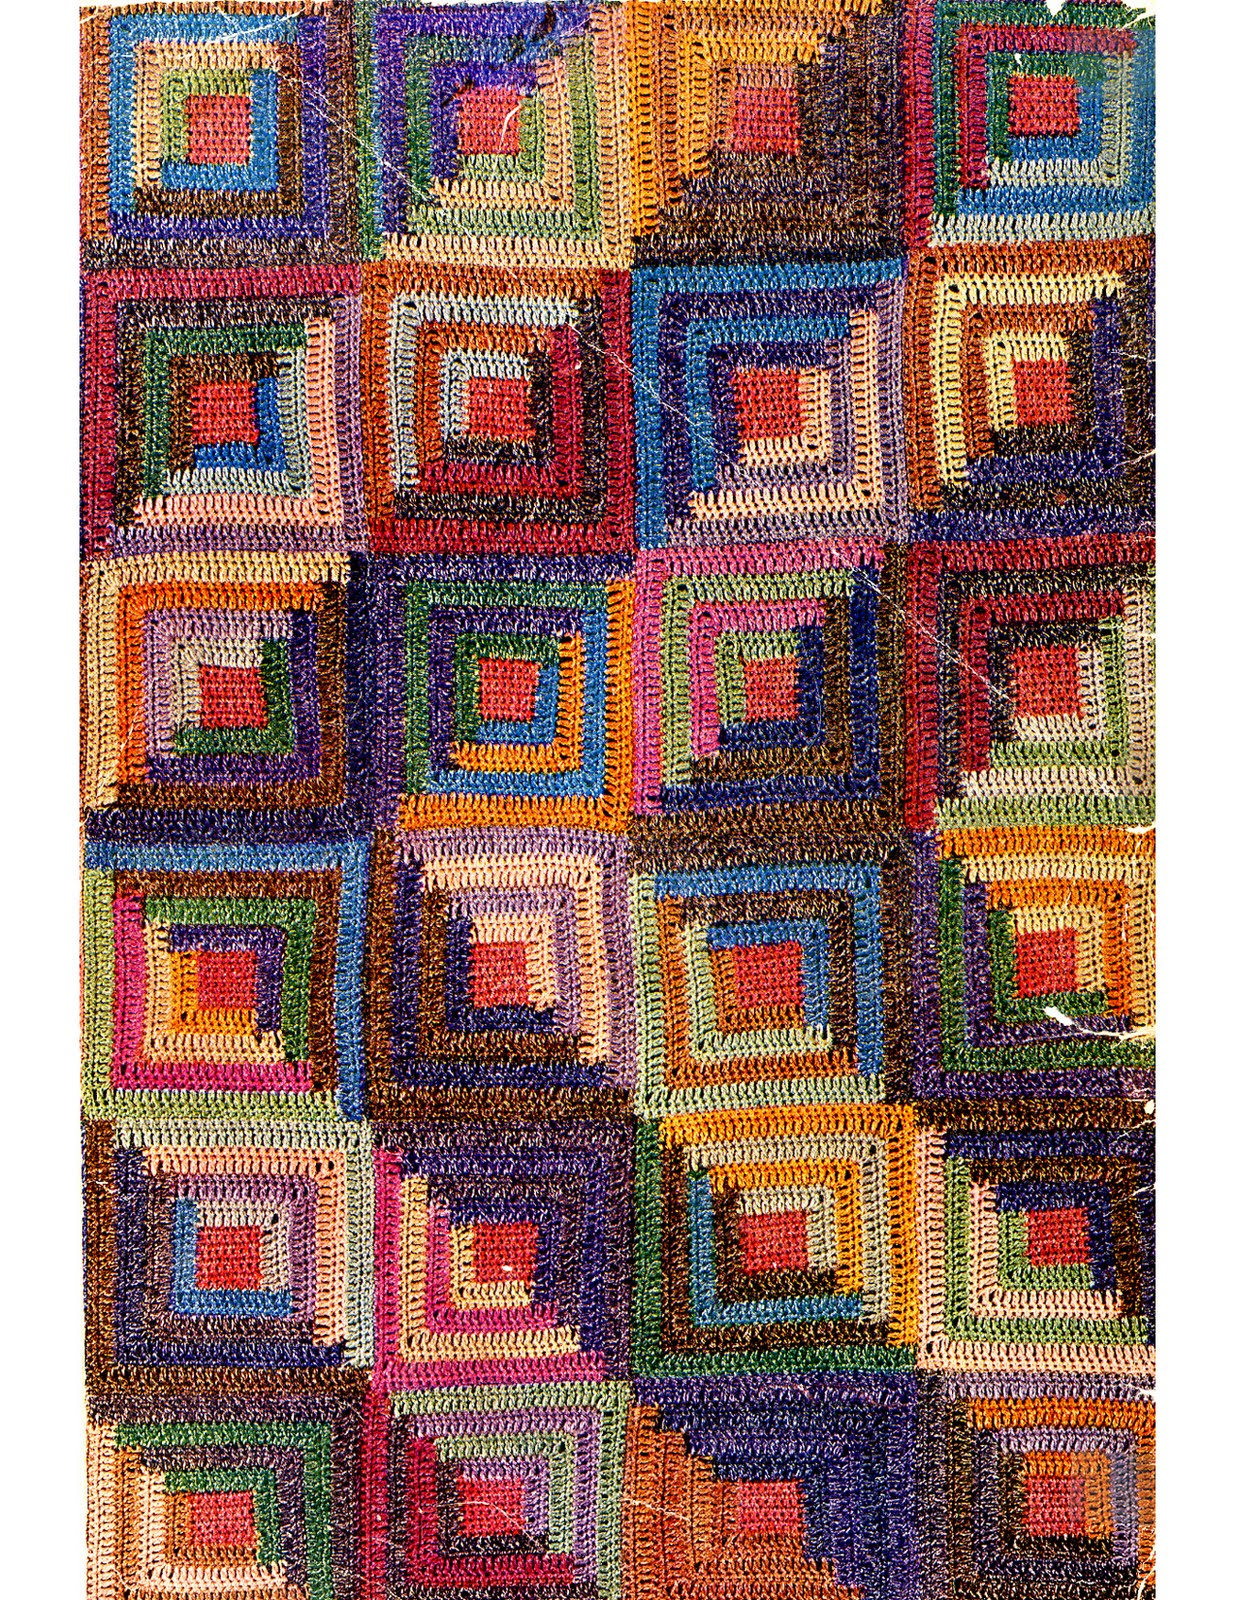 Log Cabin Patterns : Afghan cabin crochet log pattern patterns